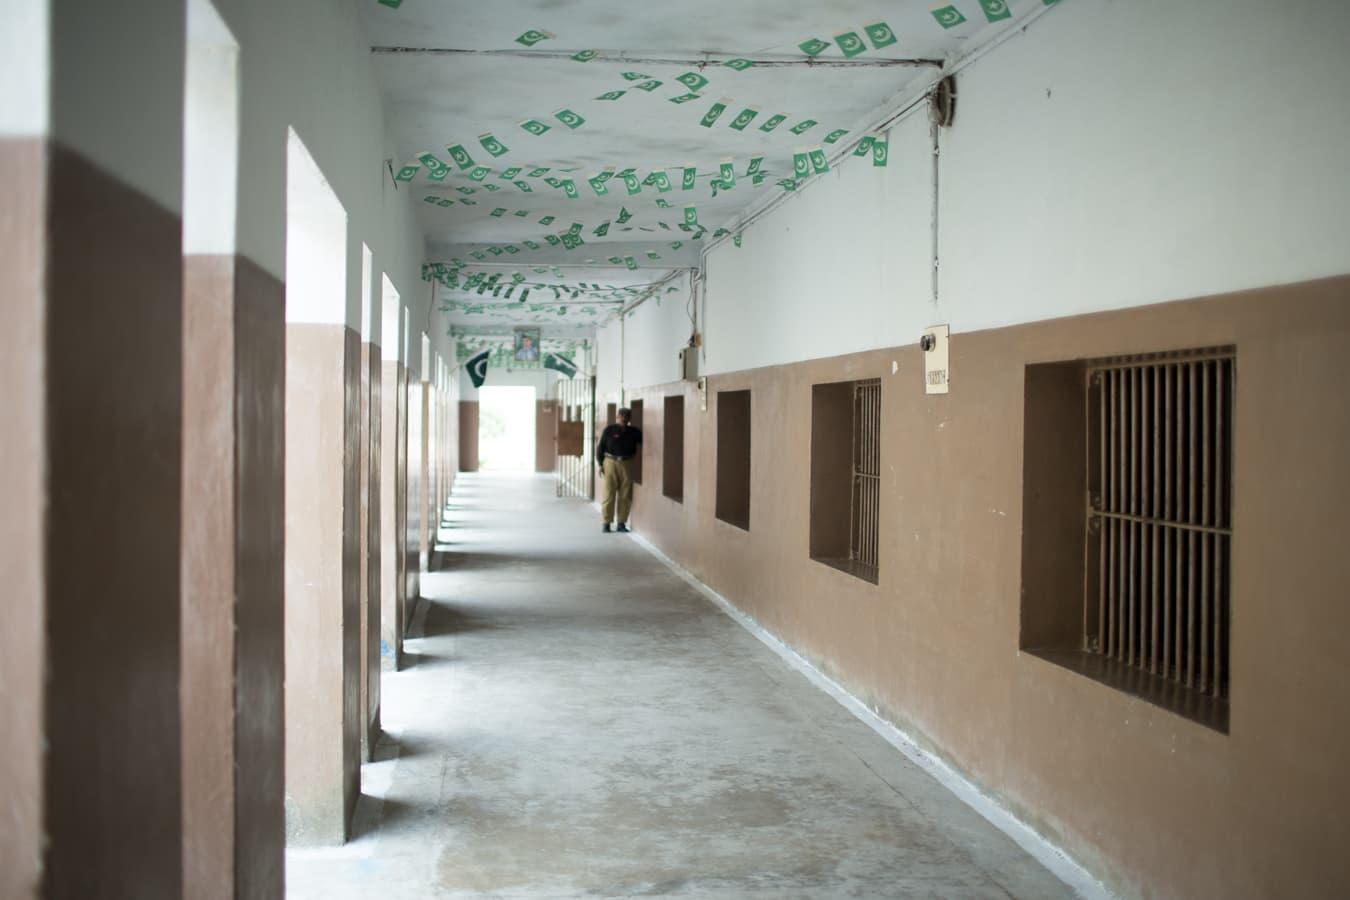 A corridor inside the Central Jail.